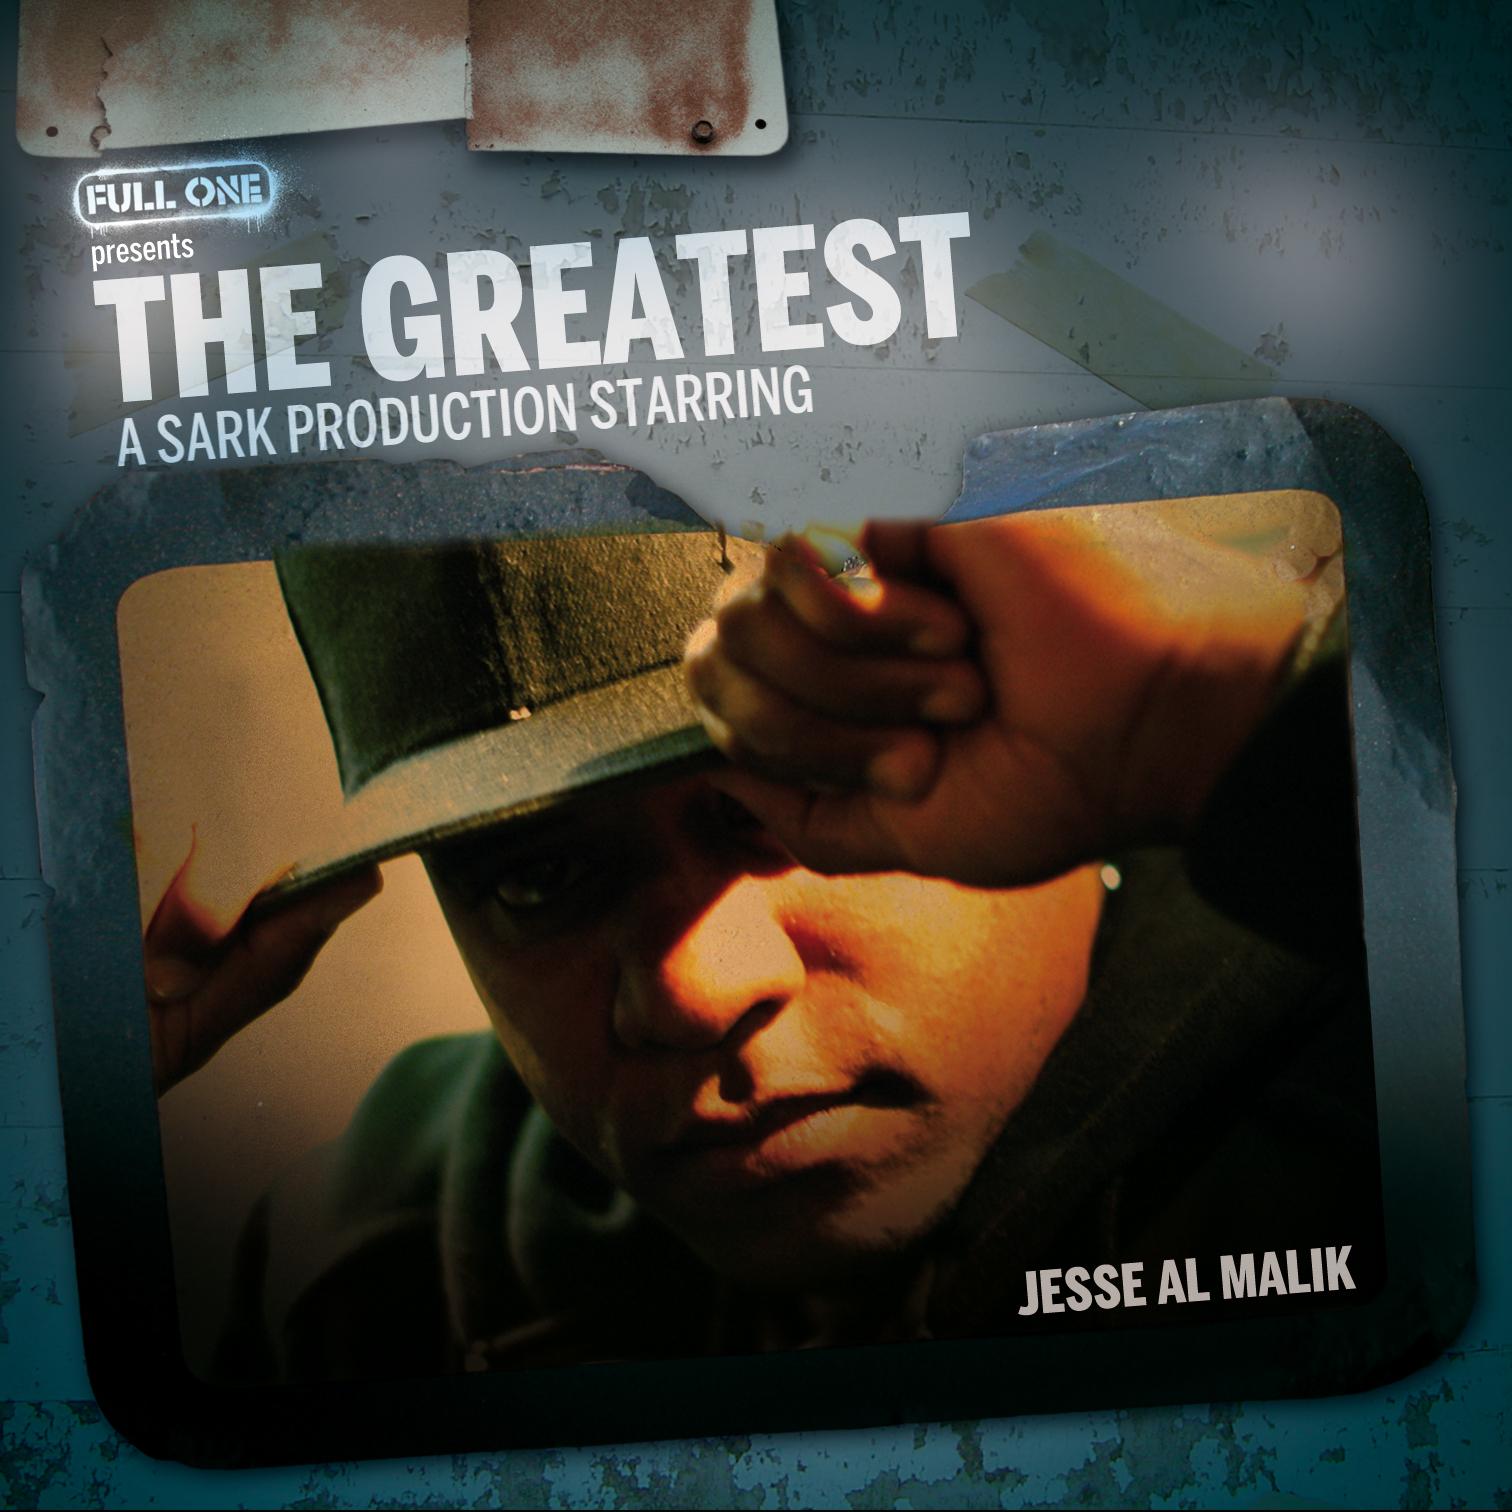 jesse-al-malik-the-greatest